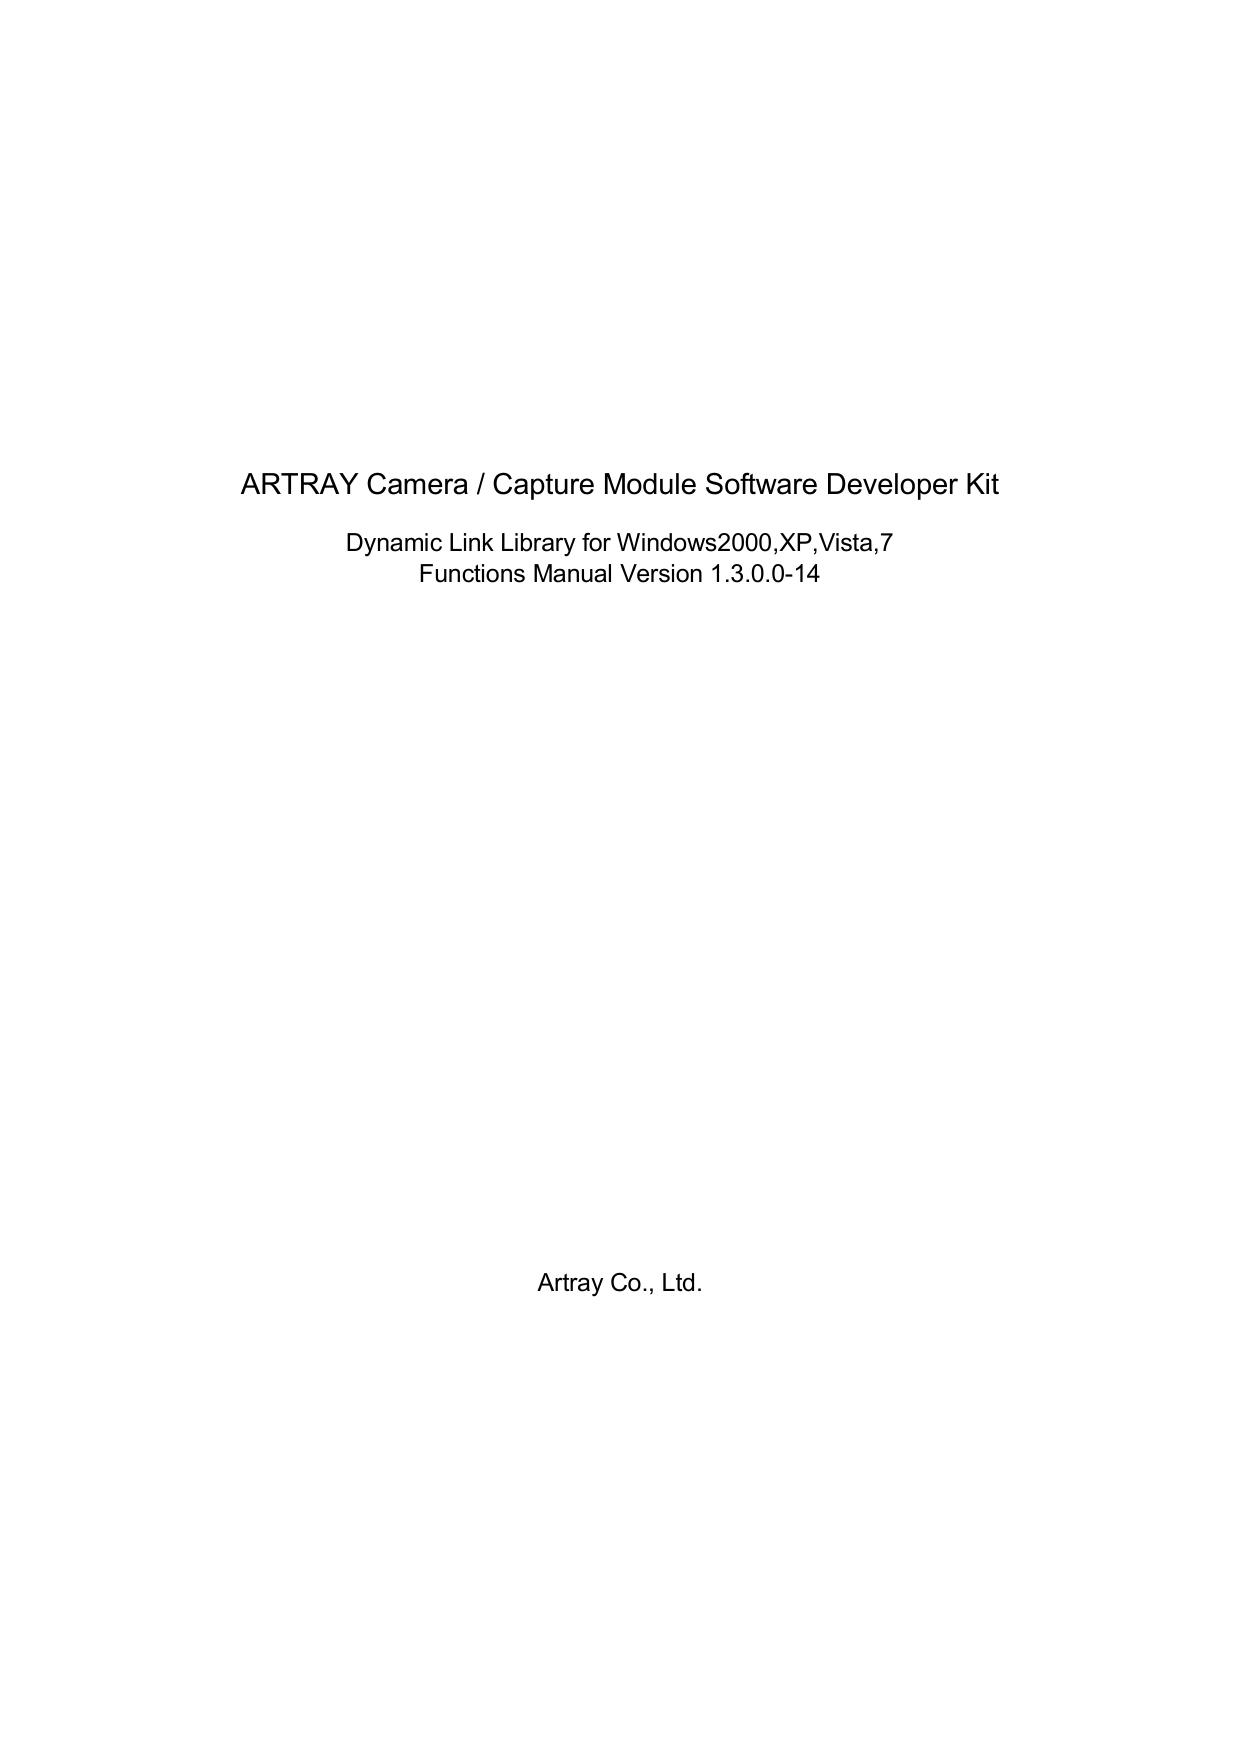 ARTRAY ARTCAM-036MI USB2.0 CMOS CAMERA DRIVERS WINDOWS 7